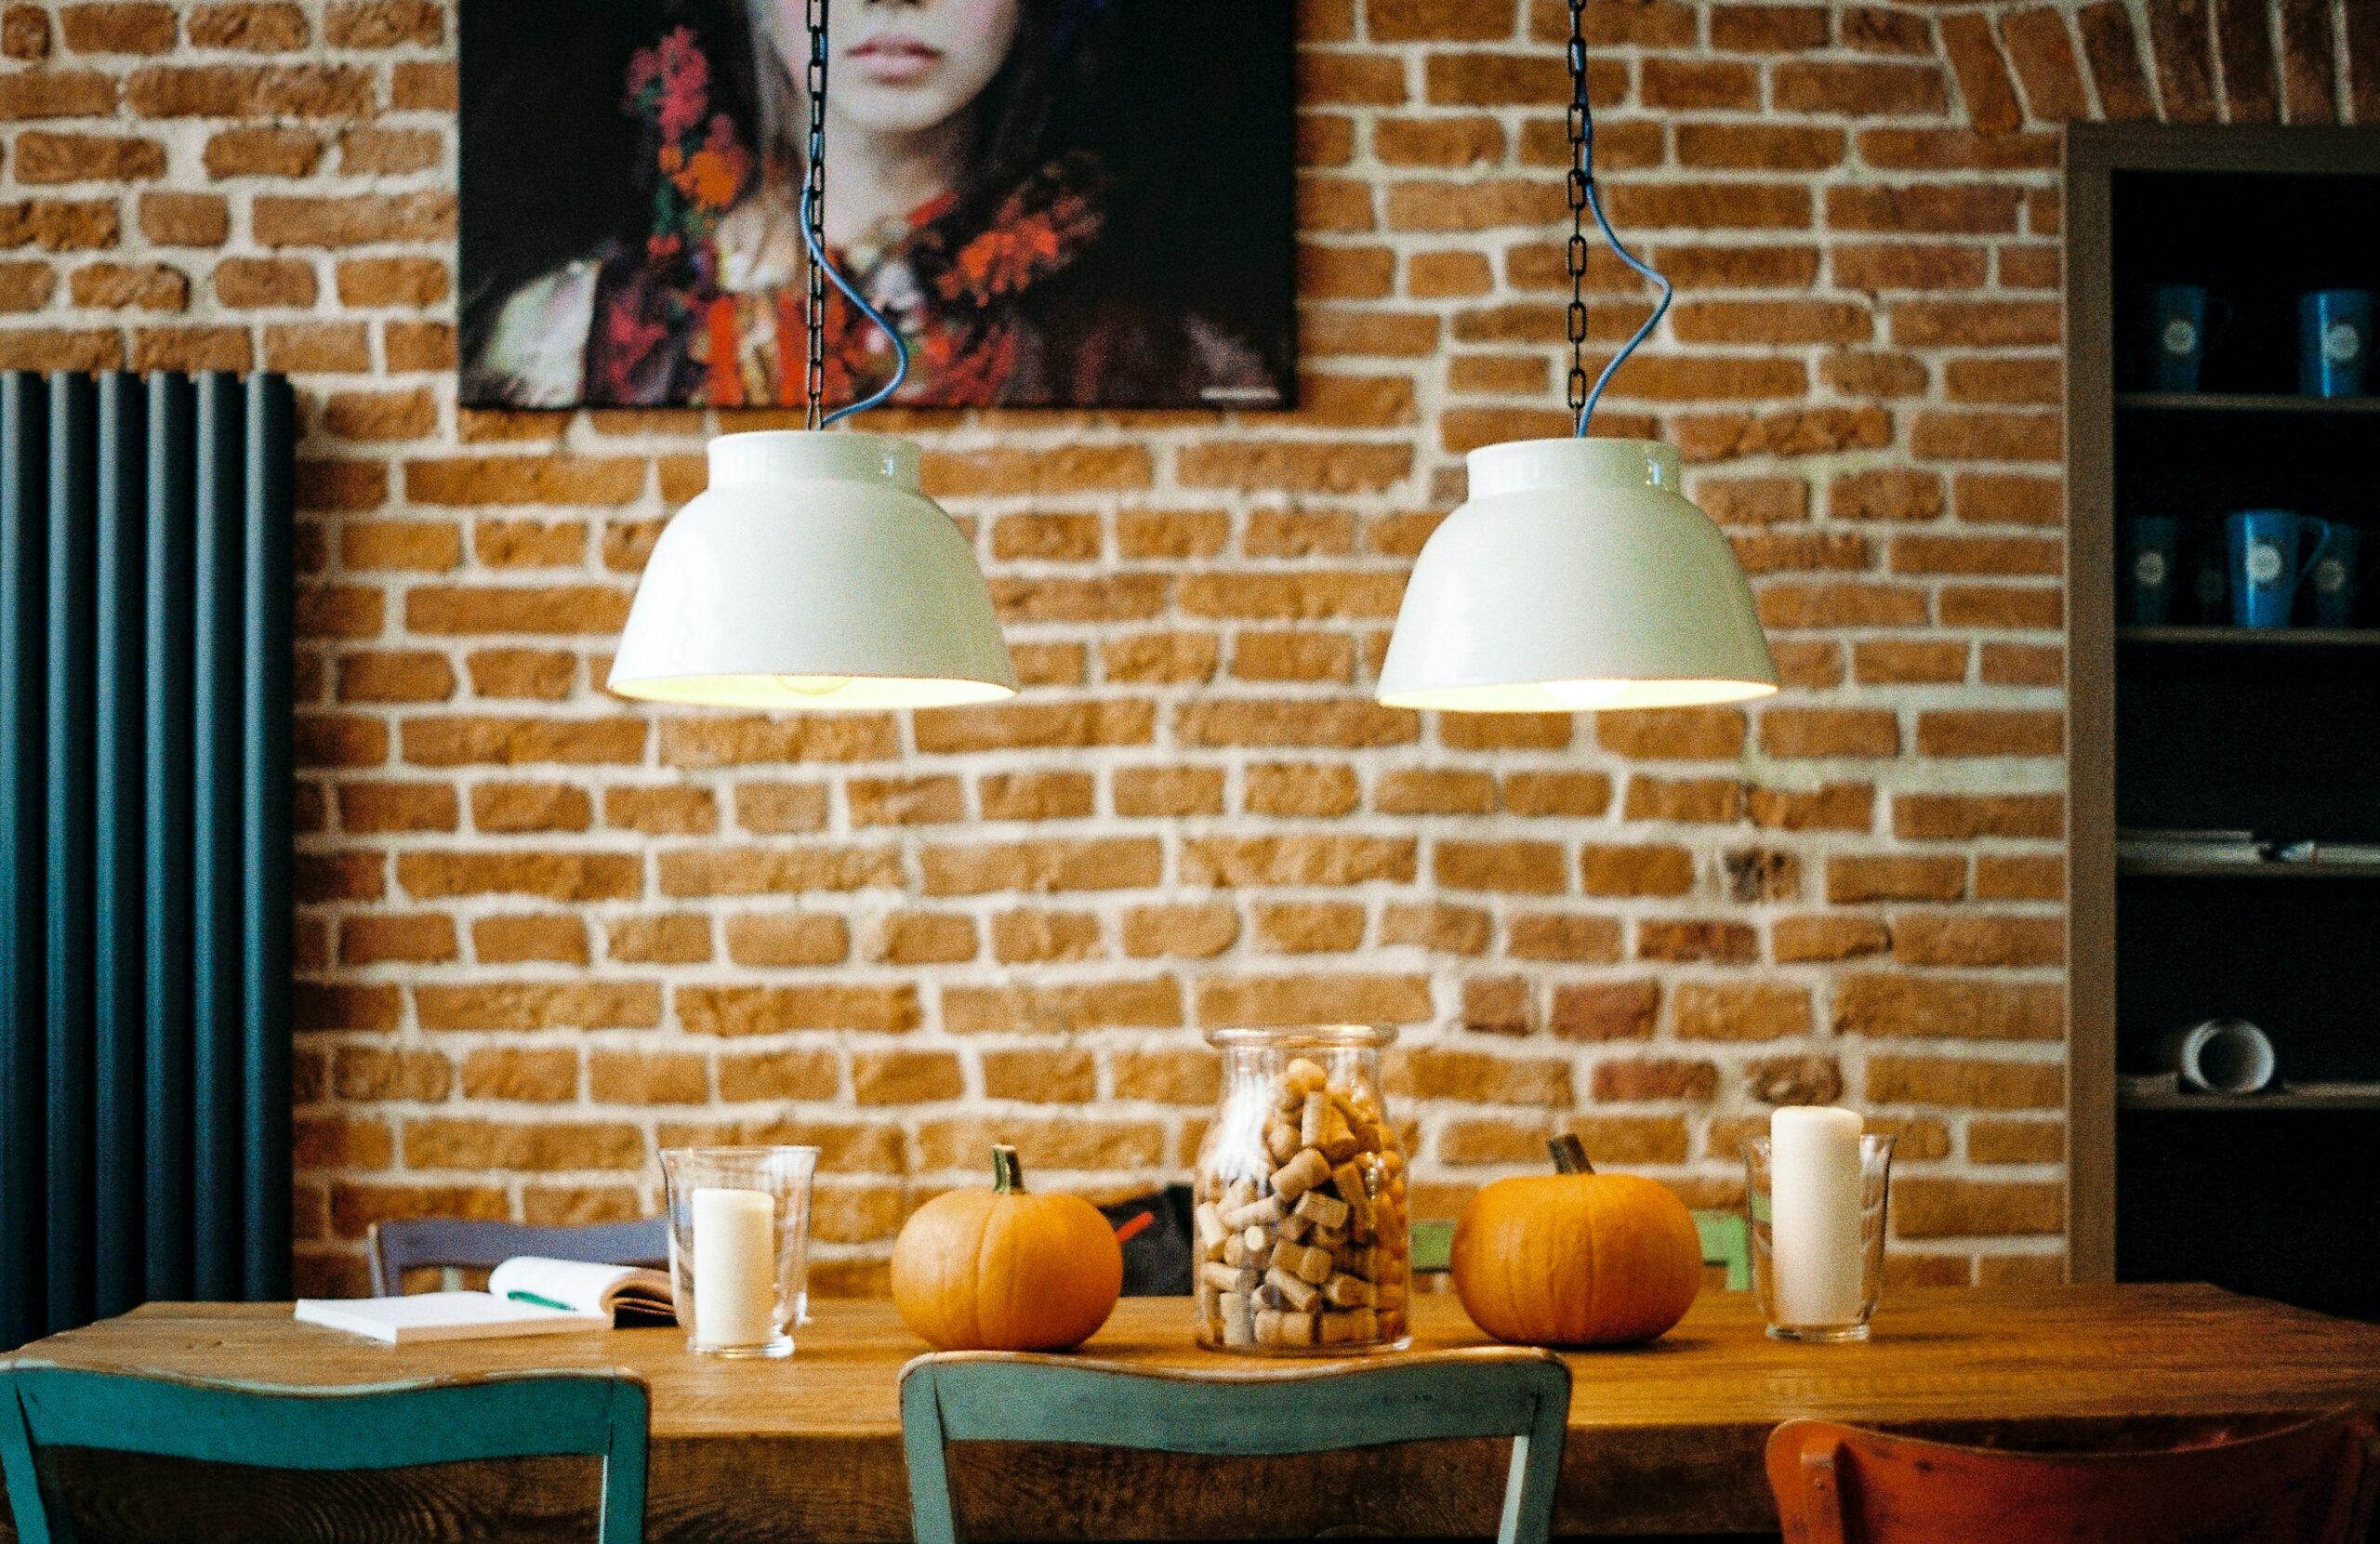 No radiators needed: Alternative ways to heat your home